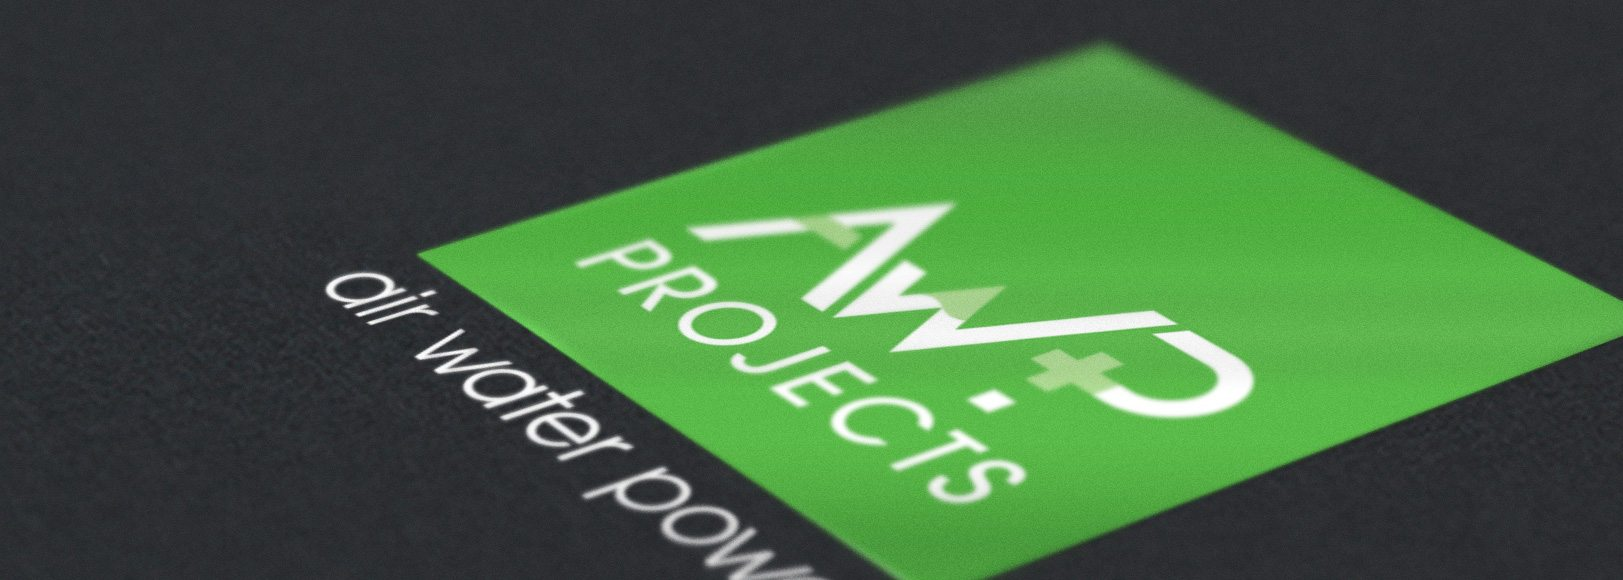 AWP - Cronulla Web Design - Brand Design Sutherland Shire